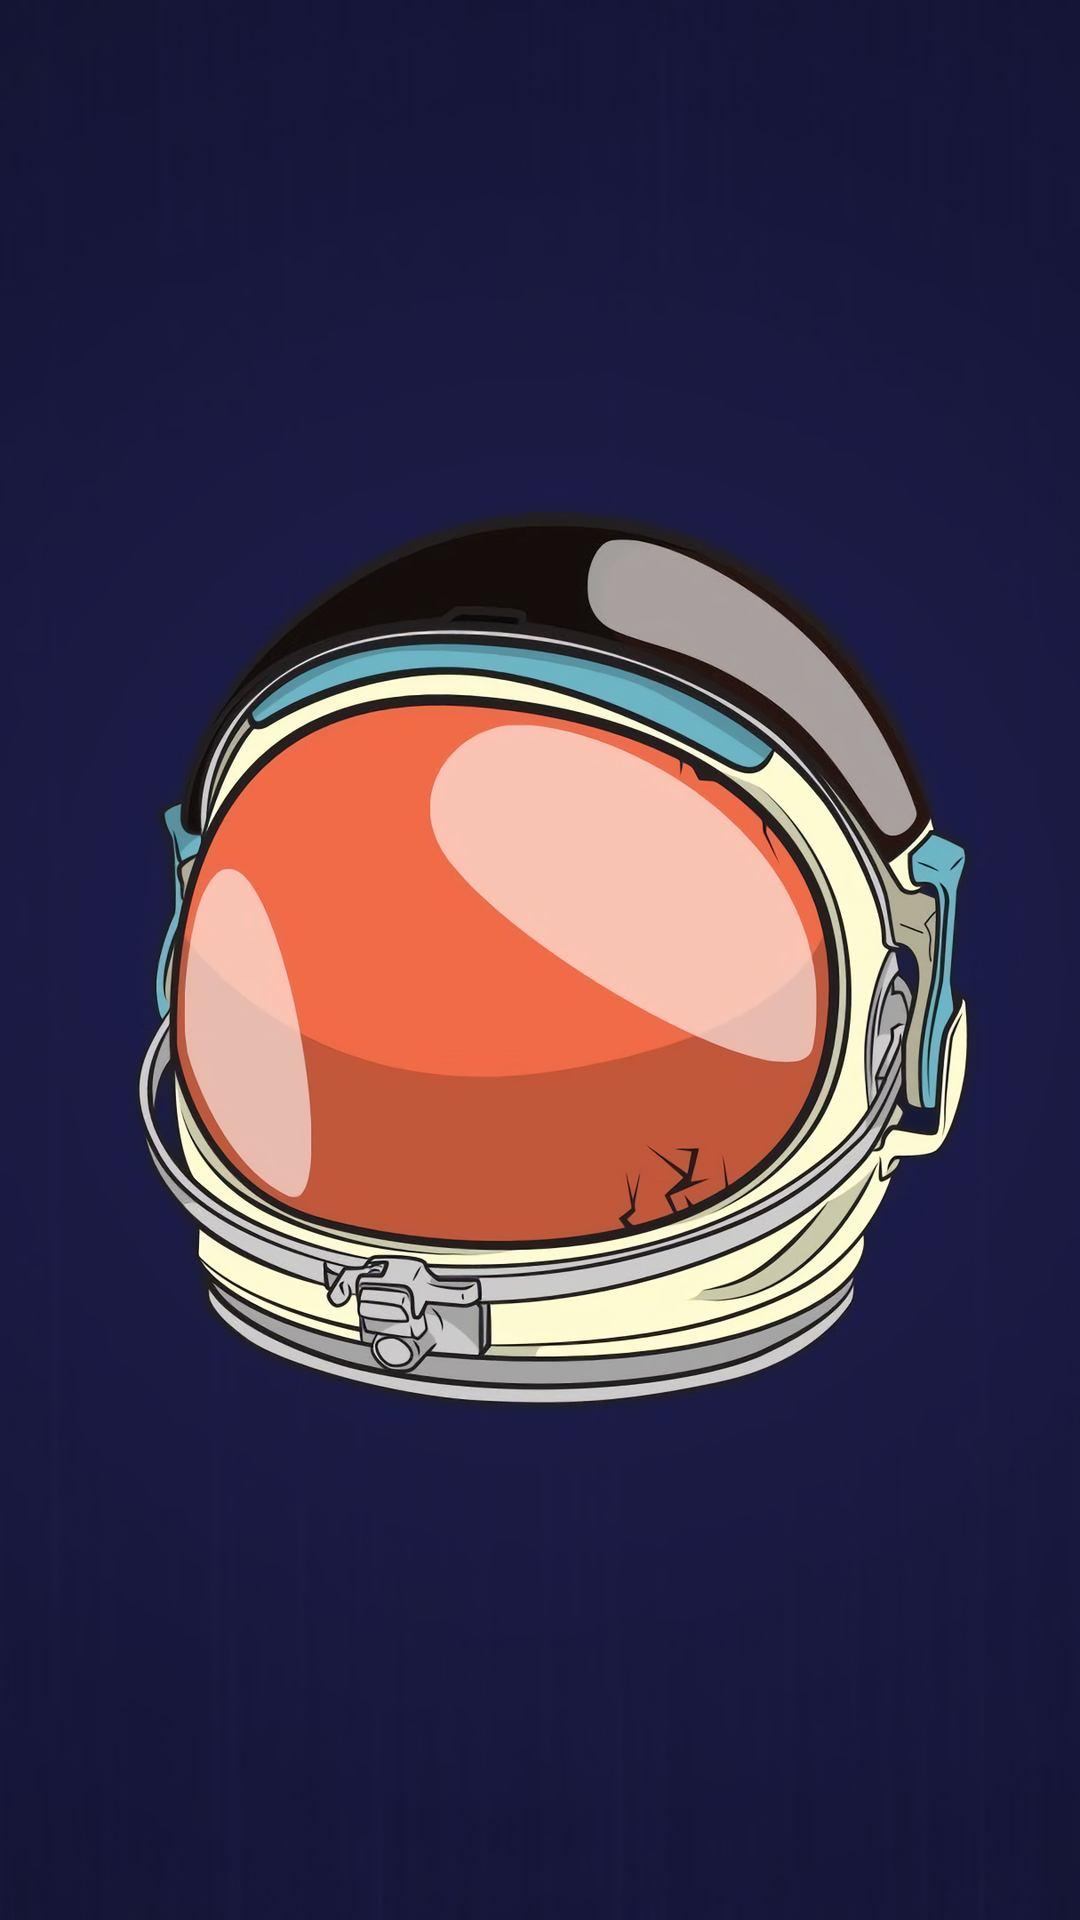 astronaut helmet minimal 4k q9 1080x1920 - Pack de Fondos de Pantalla Minimalistas (+100 Imagenes)